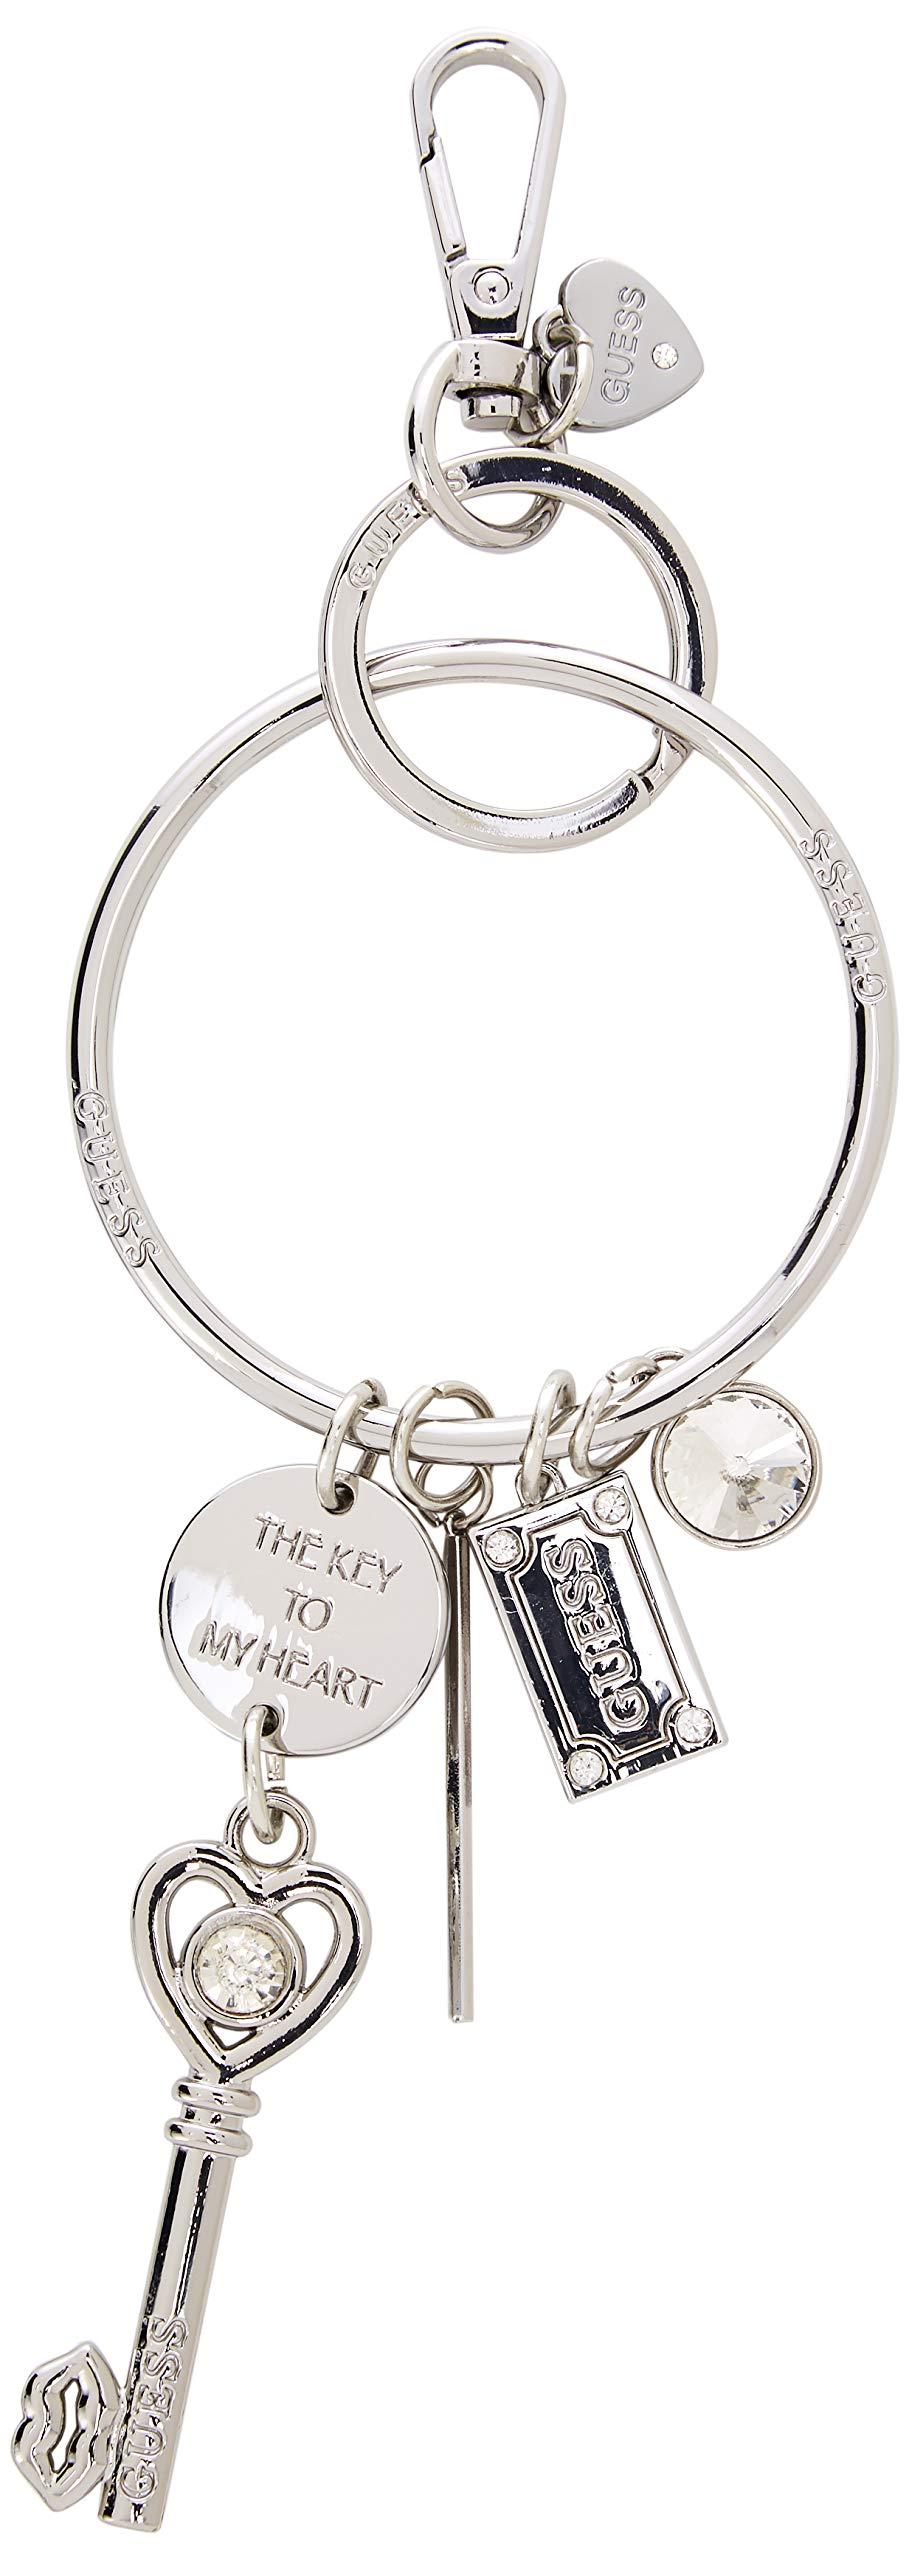 Guess Not Coordinated Keychain, Women's Portable Handbag Hanger, Silver, 8x18x1 cm (W x H L)